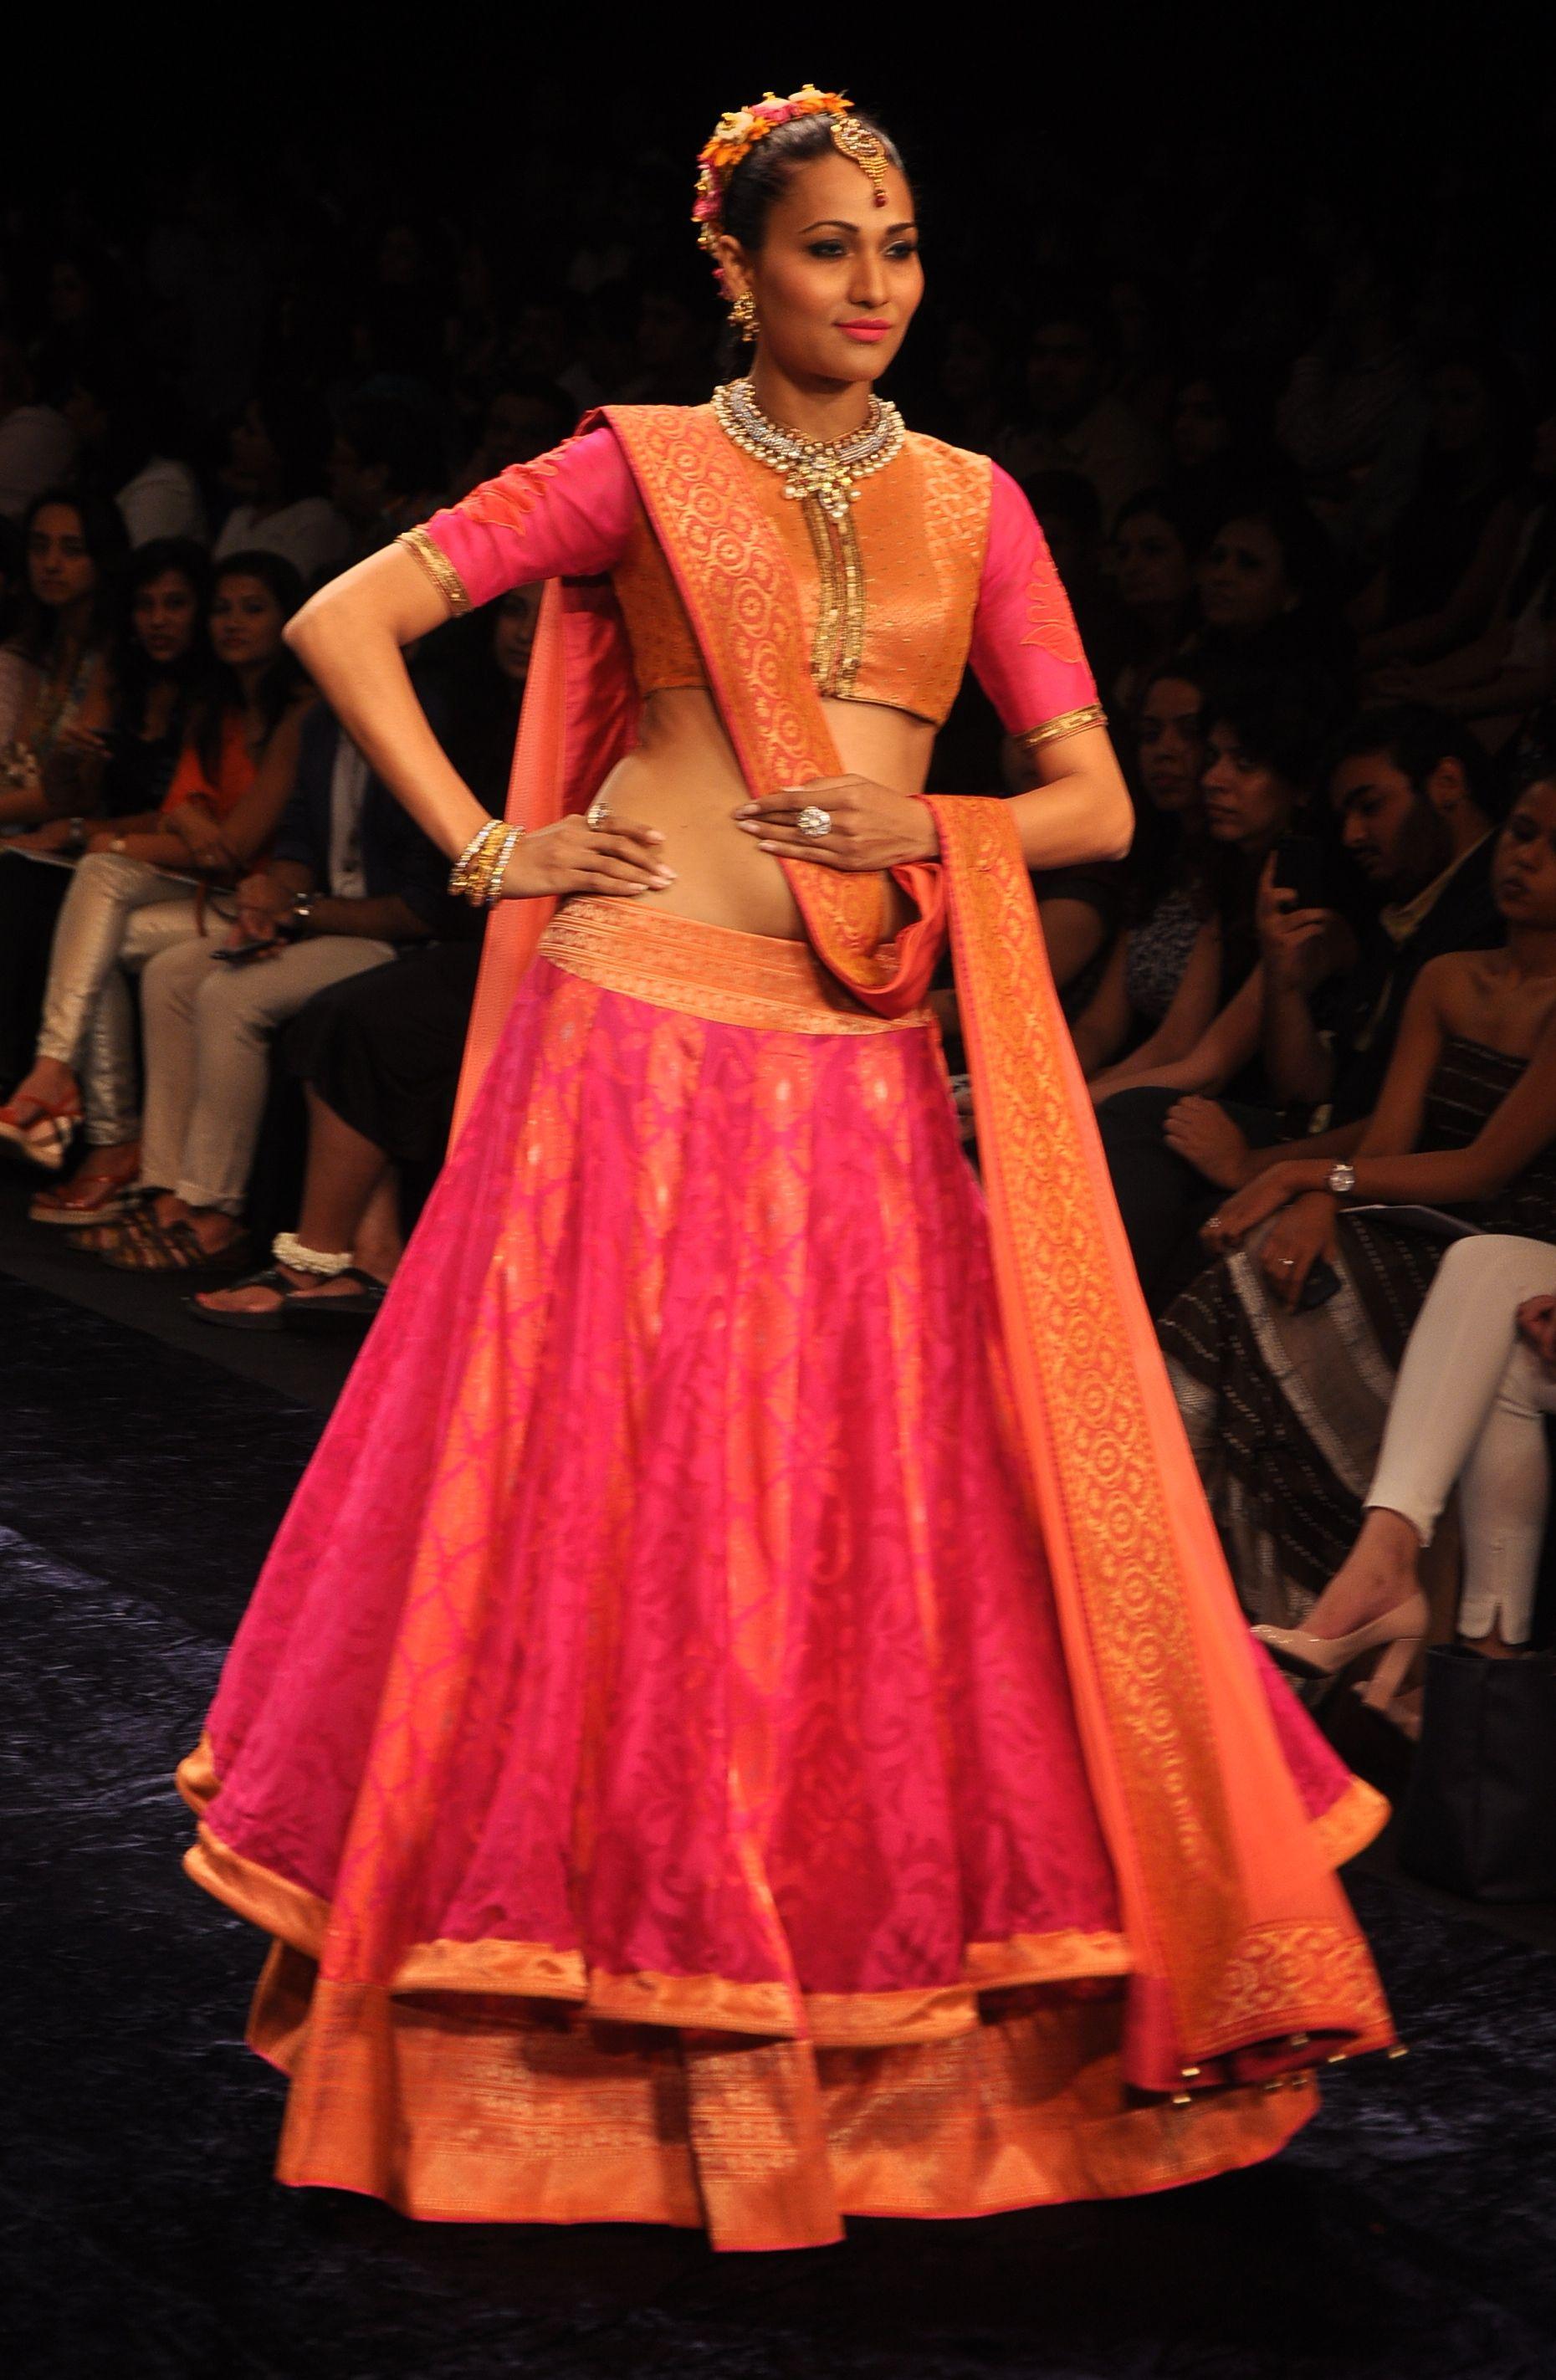 d88d8a861382 Pink net lehenga with an orange and pink brocade blouse and orange dupatta. Neeta  Lulla